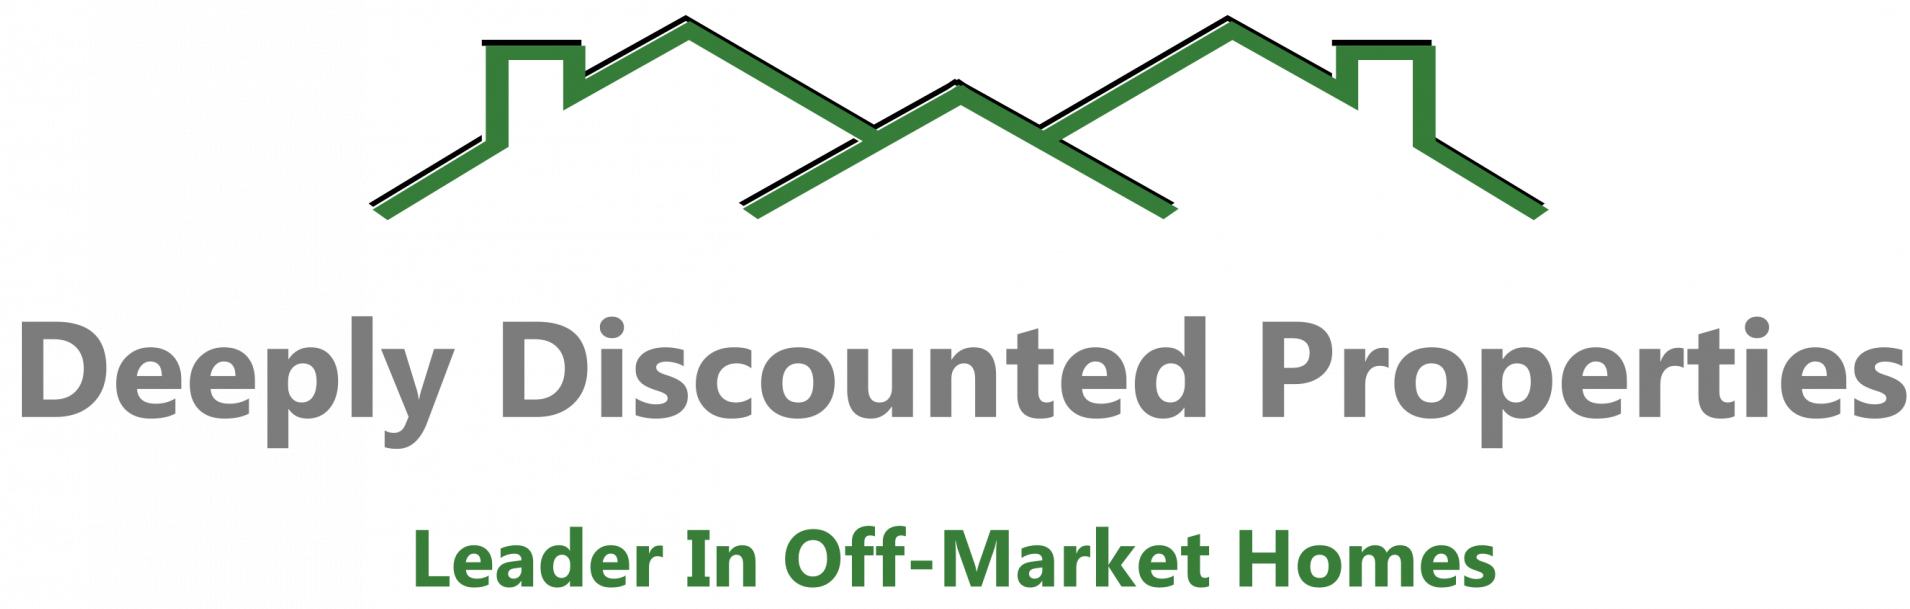 Deeply Discounted Properties logo